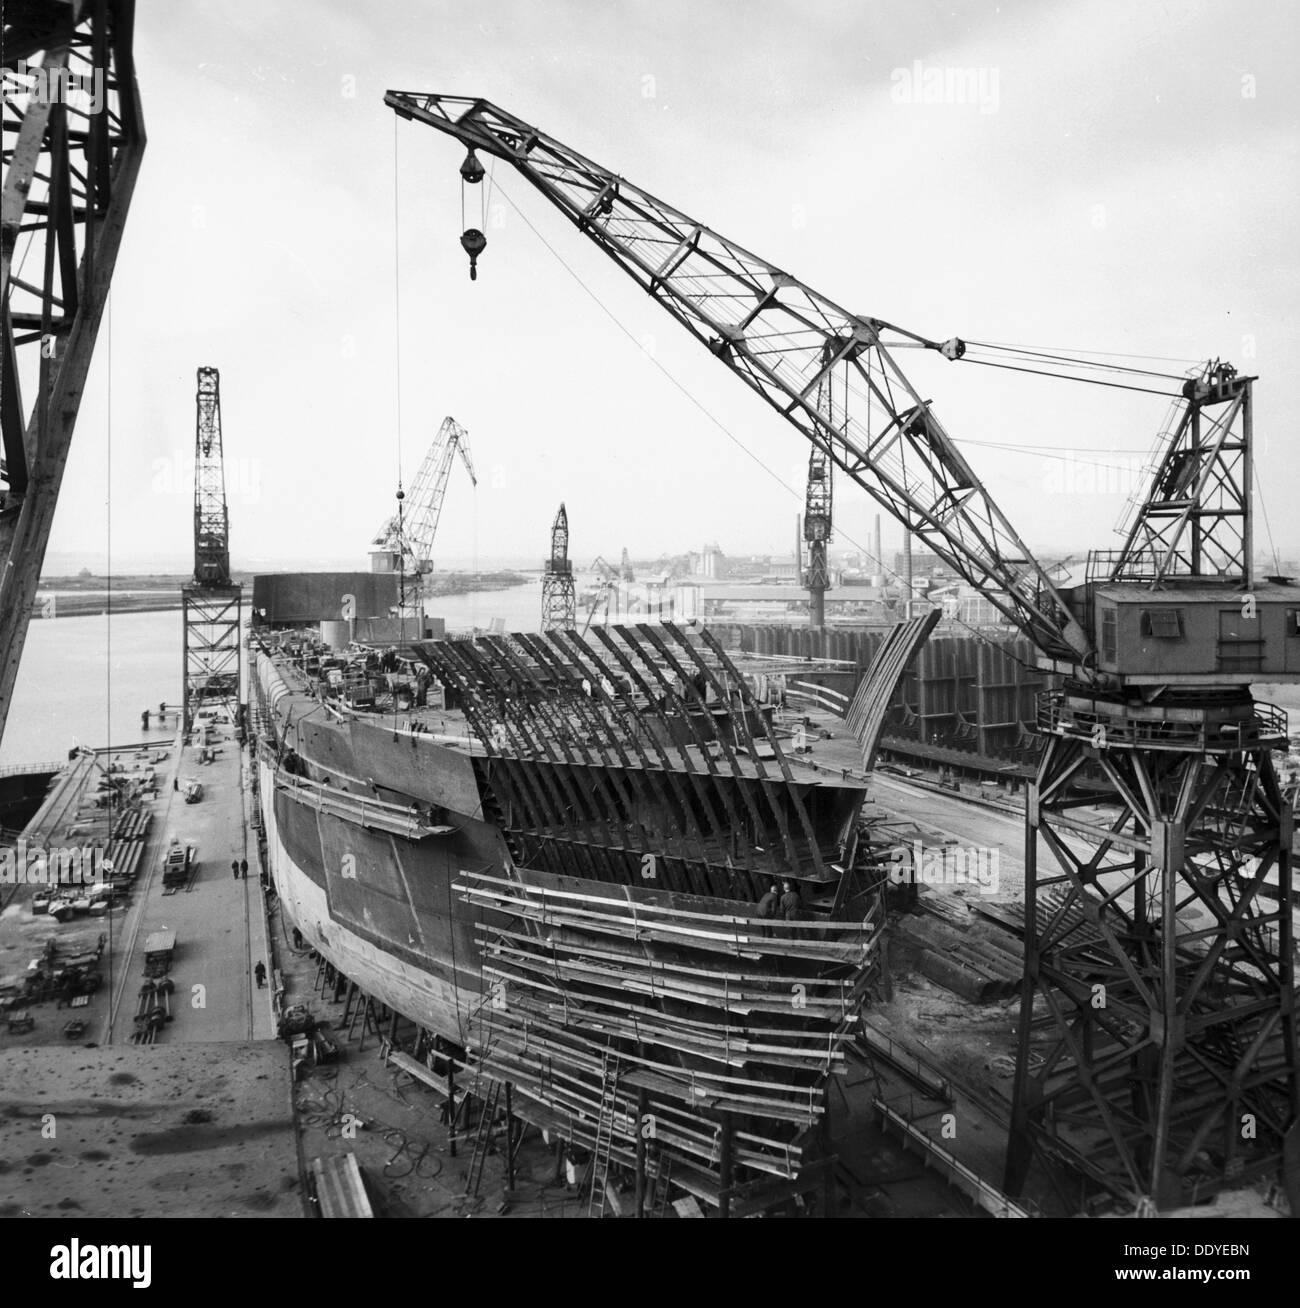 Building the M/S 'Torne' at the shipyard, Landskrona, Sweden, 1959. From the Landskrona Museum Collection. - Stock Image